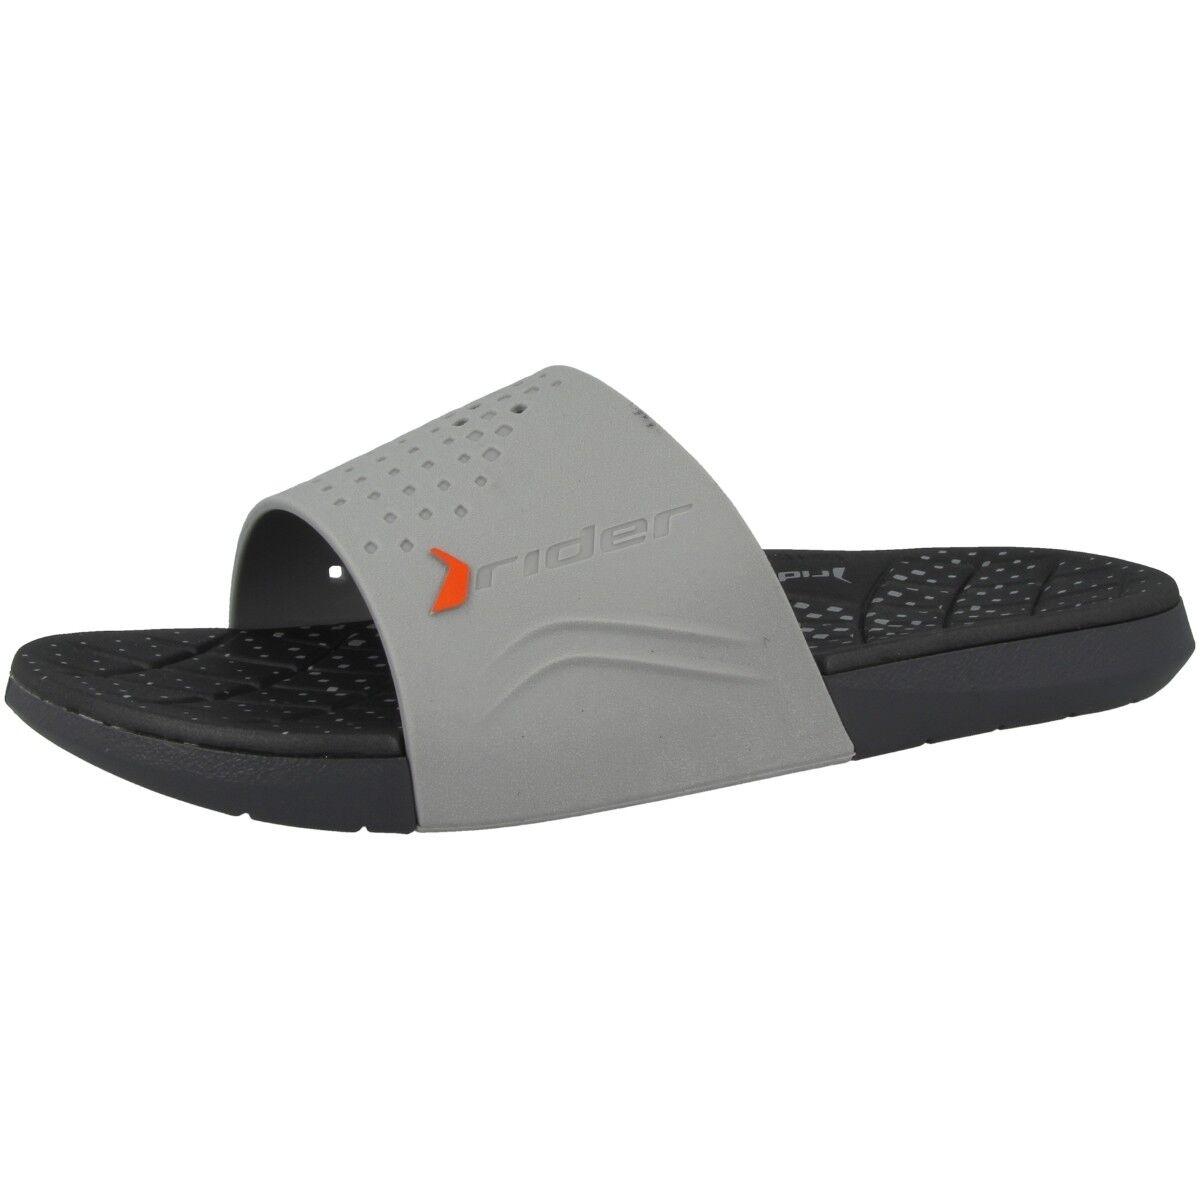 Rider Infinity Slide Annuncio shoes Ciabatte da Bagno Sandali Pantofole grey